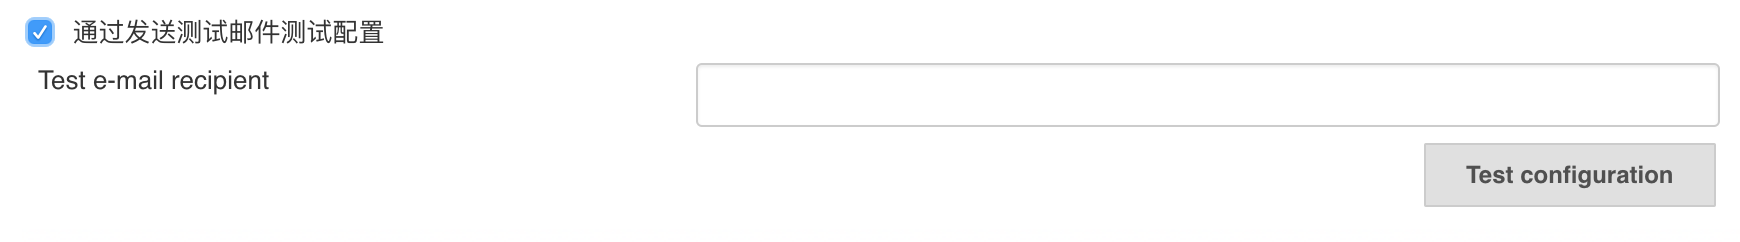 Jenkins 测试邮件配置